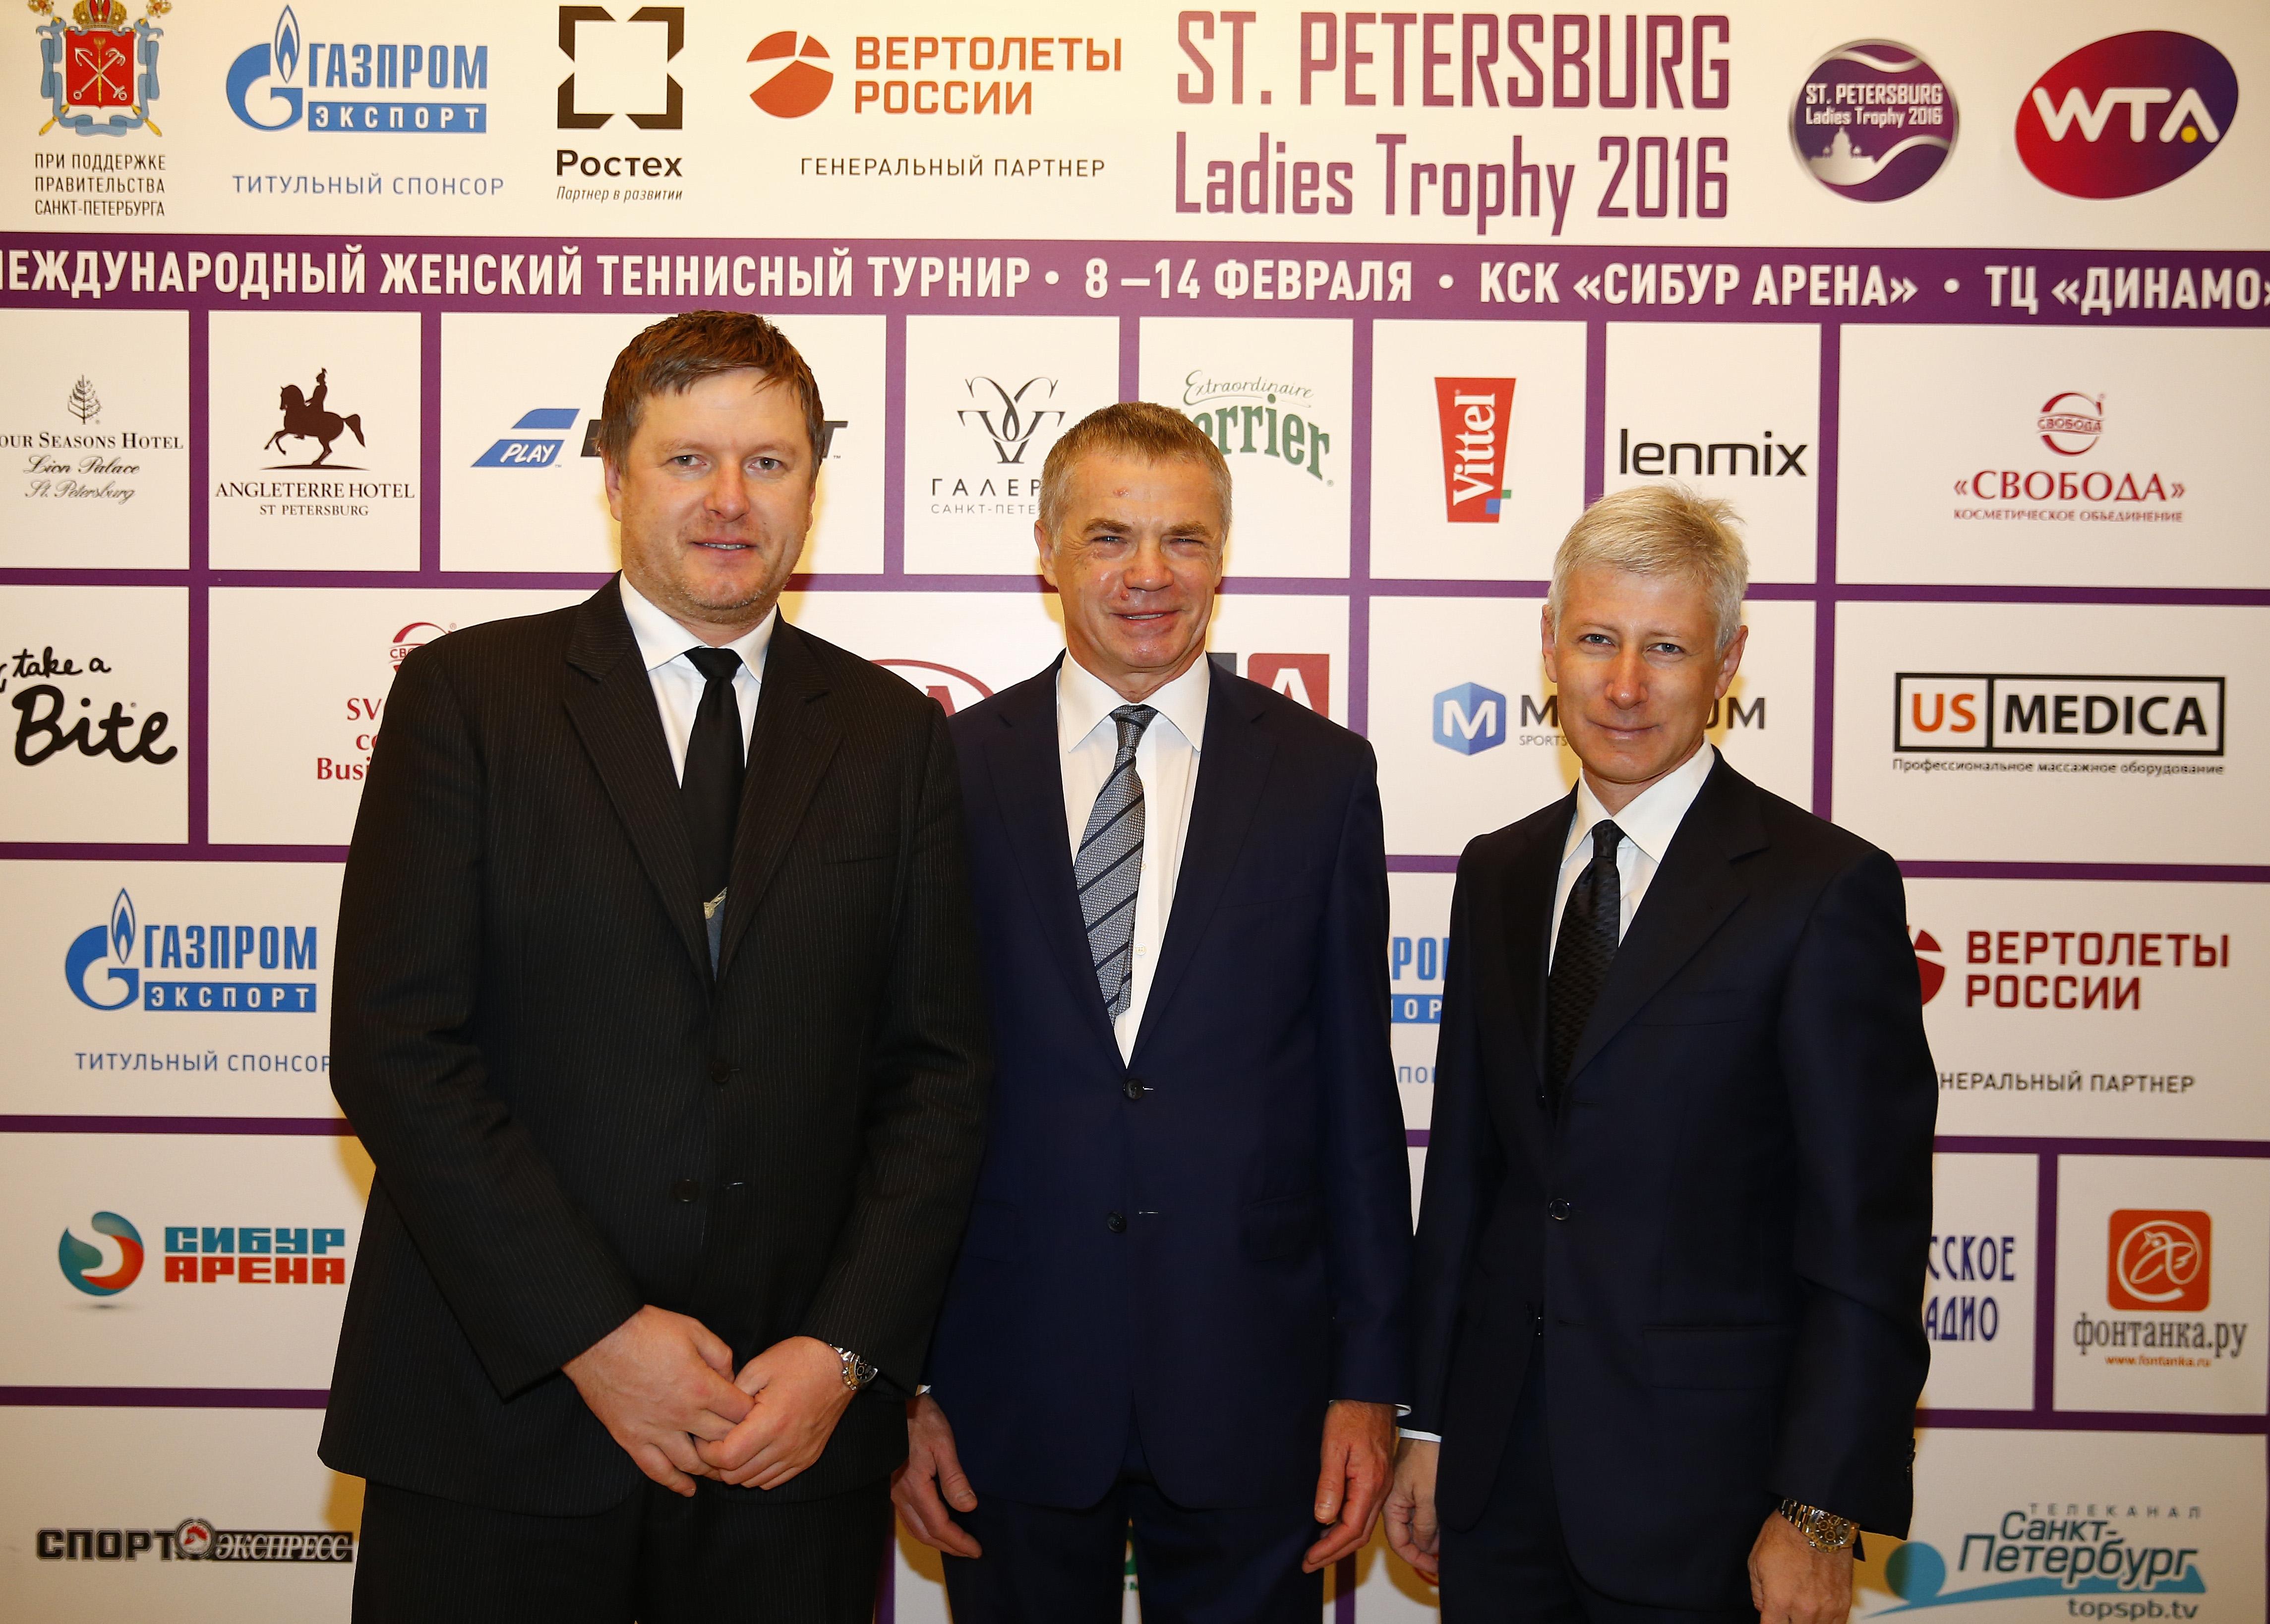 Евгений Кафельников, Александр Медведев, Алексей Селиваненко